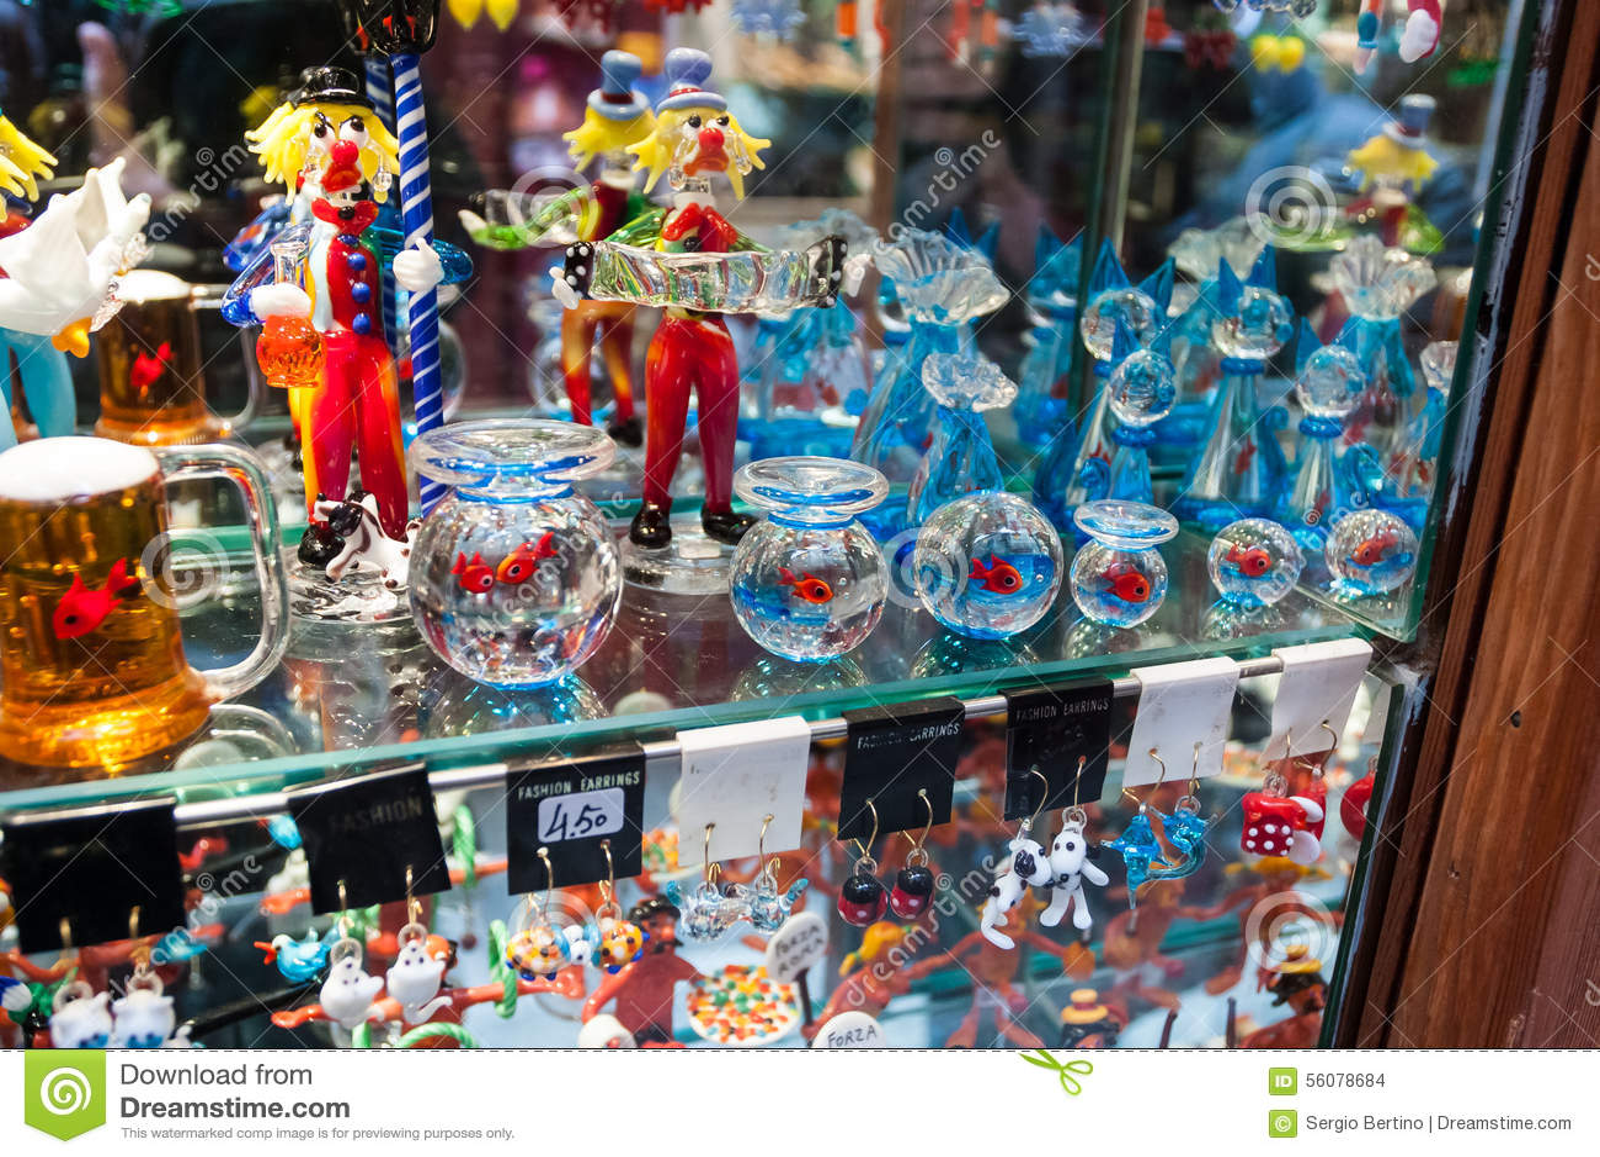 Affichage de verre de murano photo stock image 56078684 - Boutique verre de murano ...